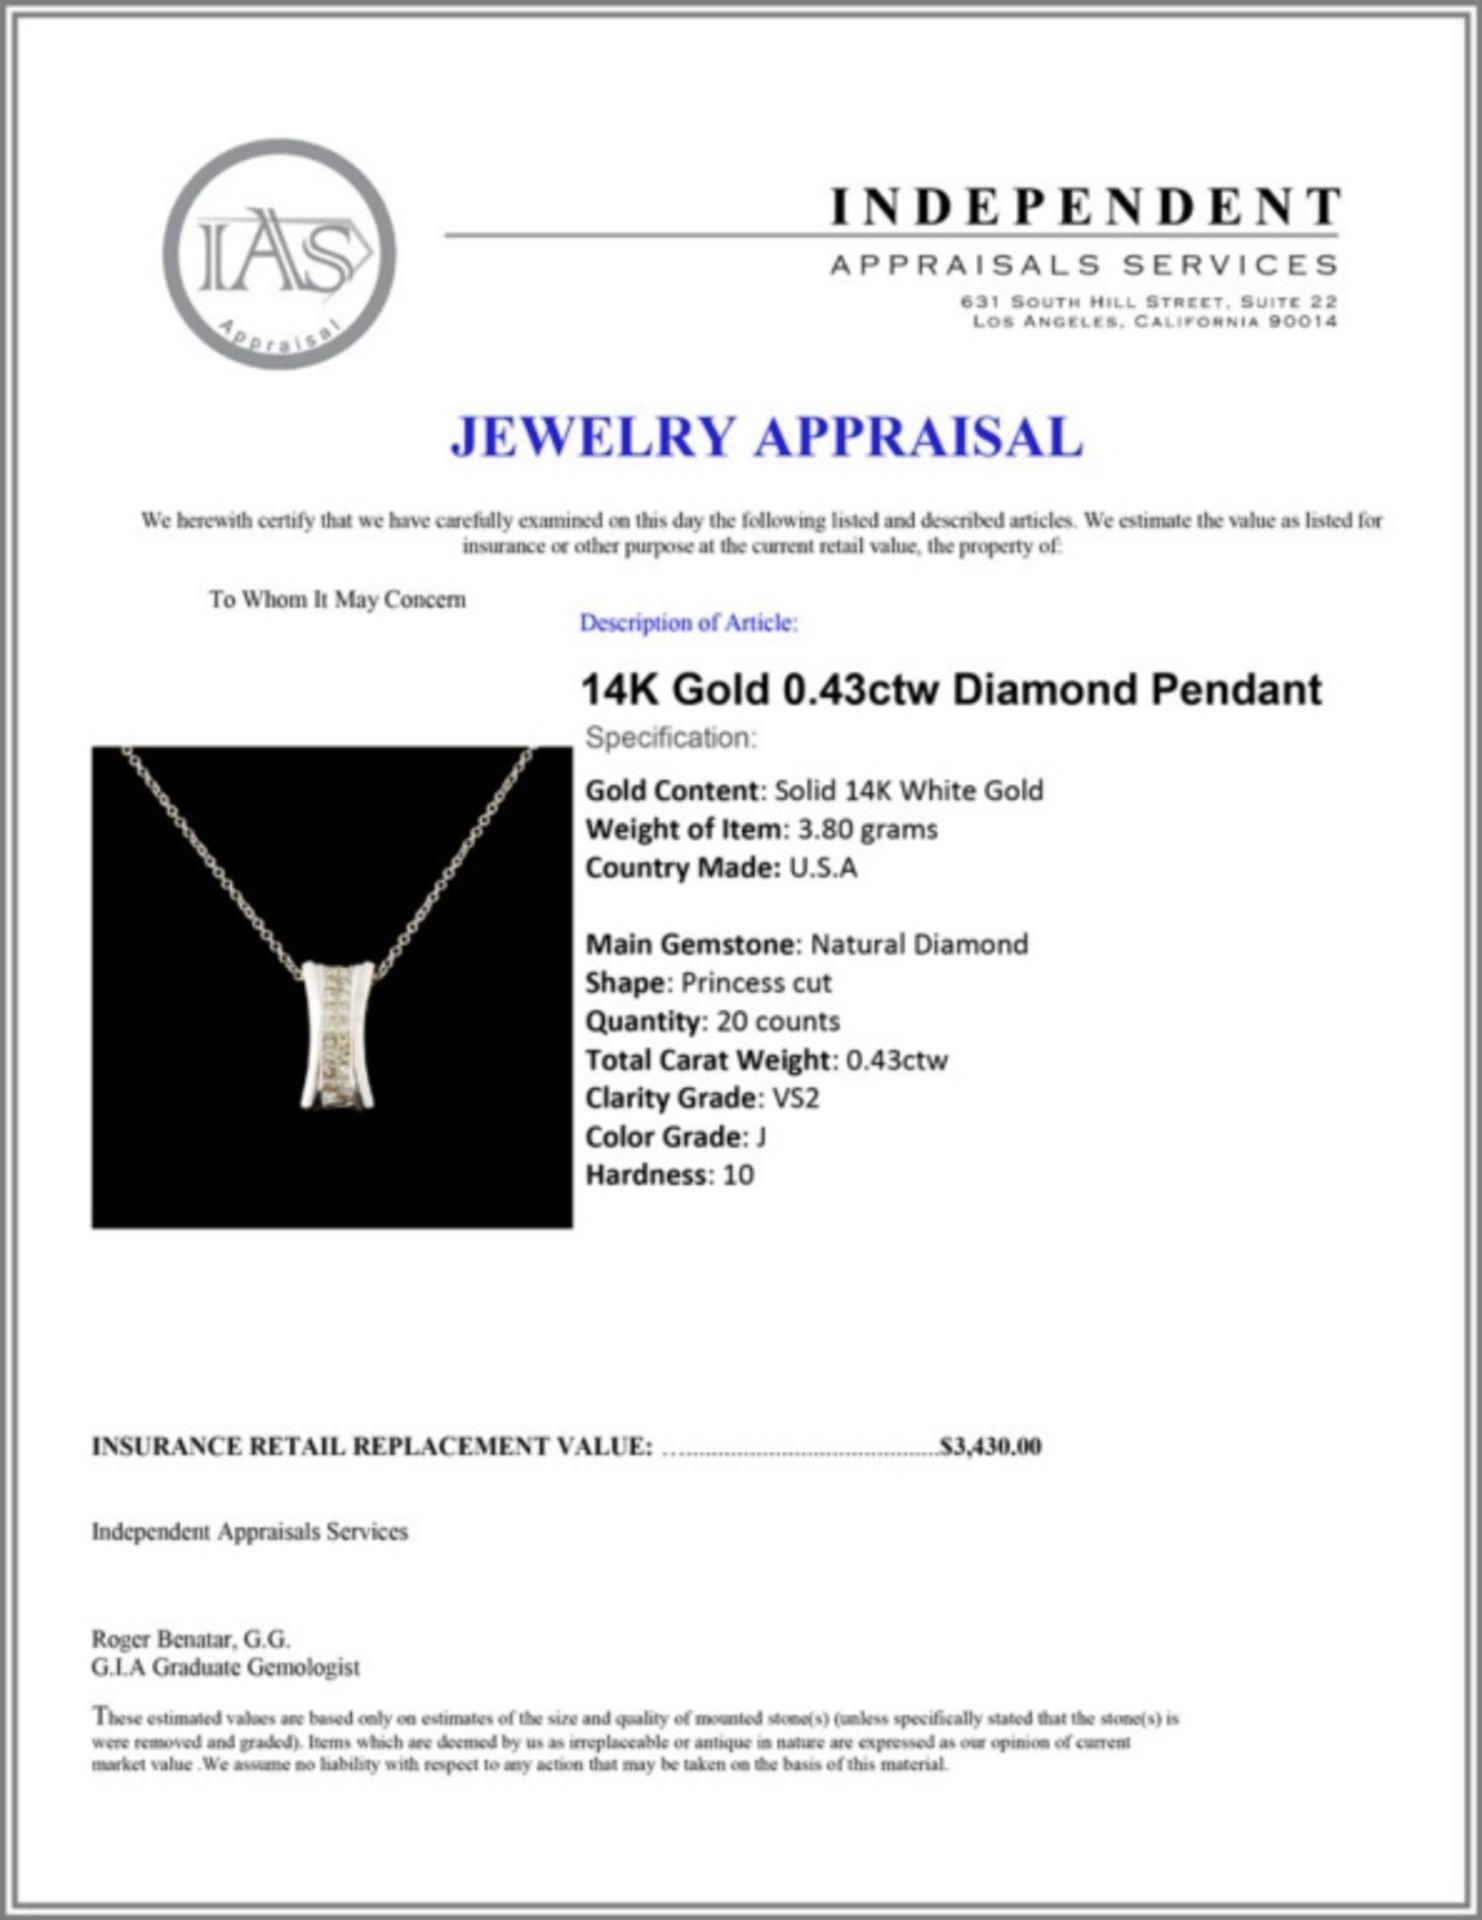 14K Gold 0.43ctw Diamond Pendant - Image 4 of 4